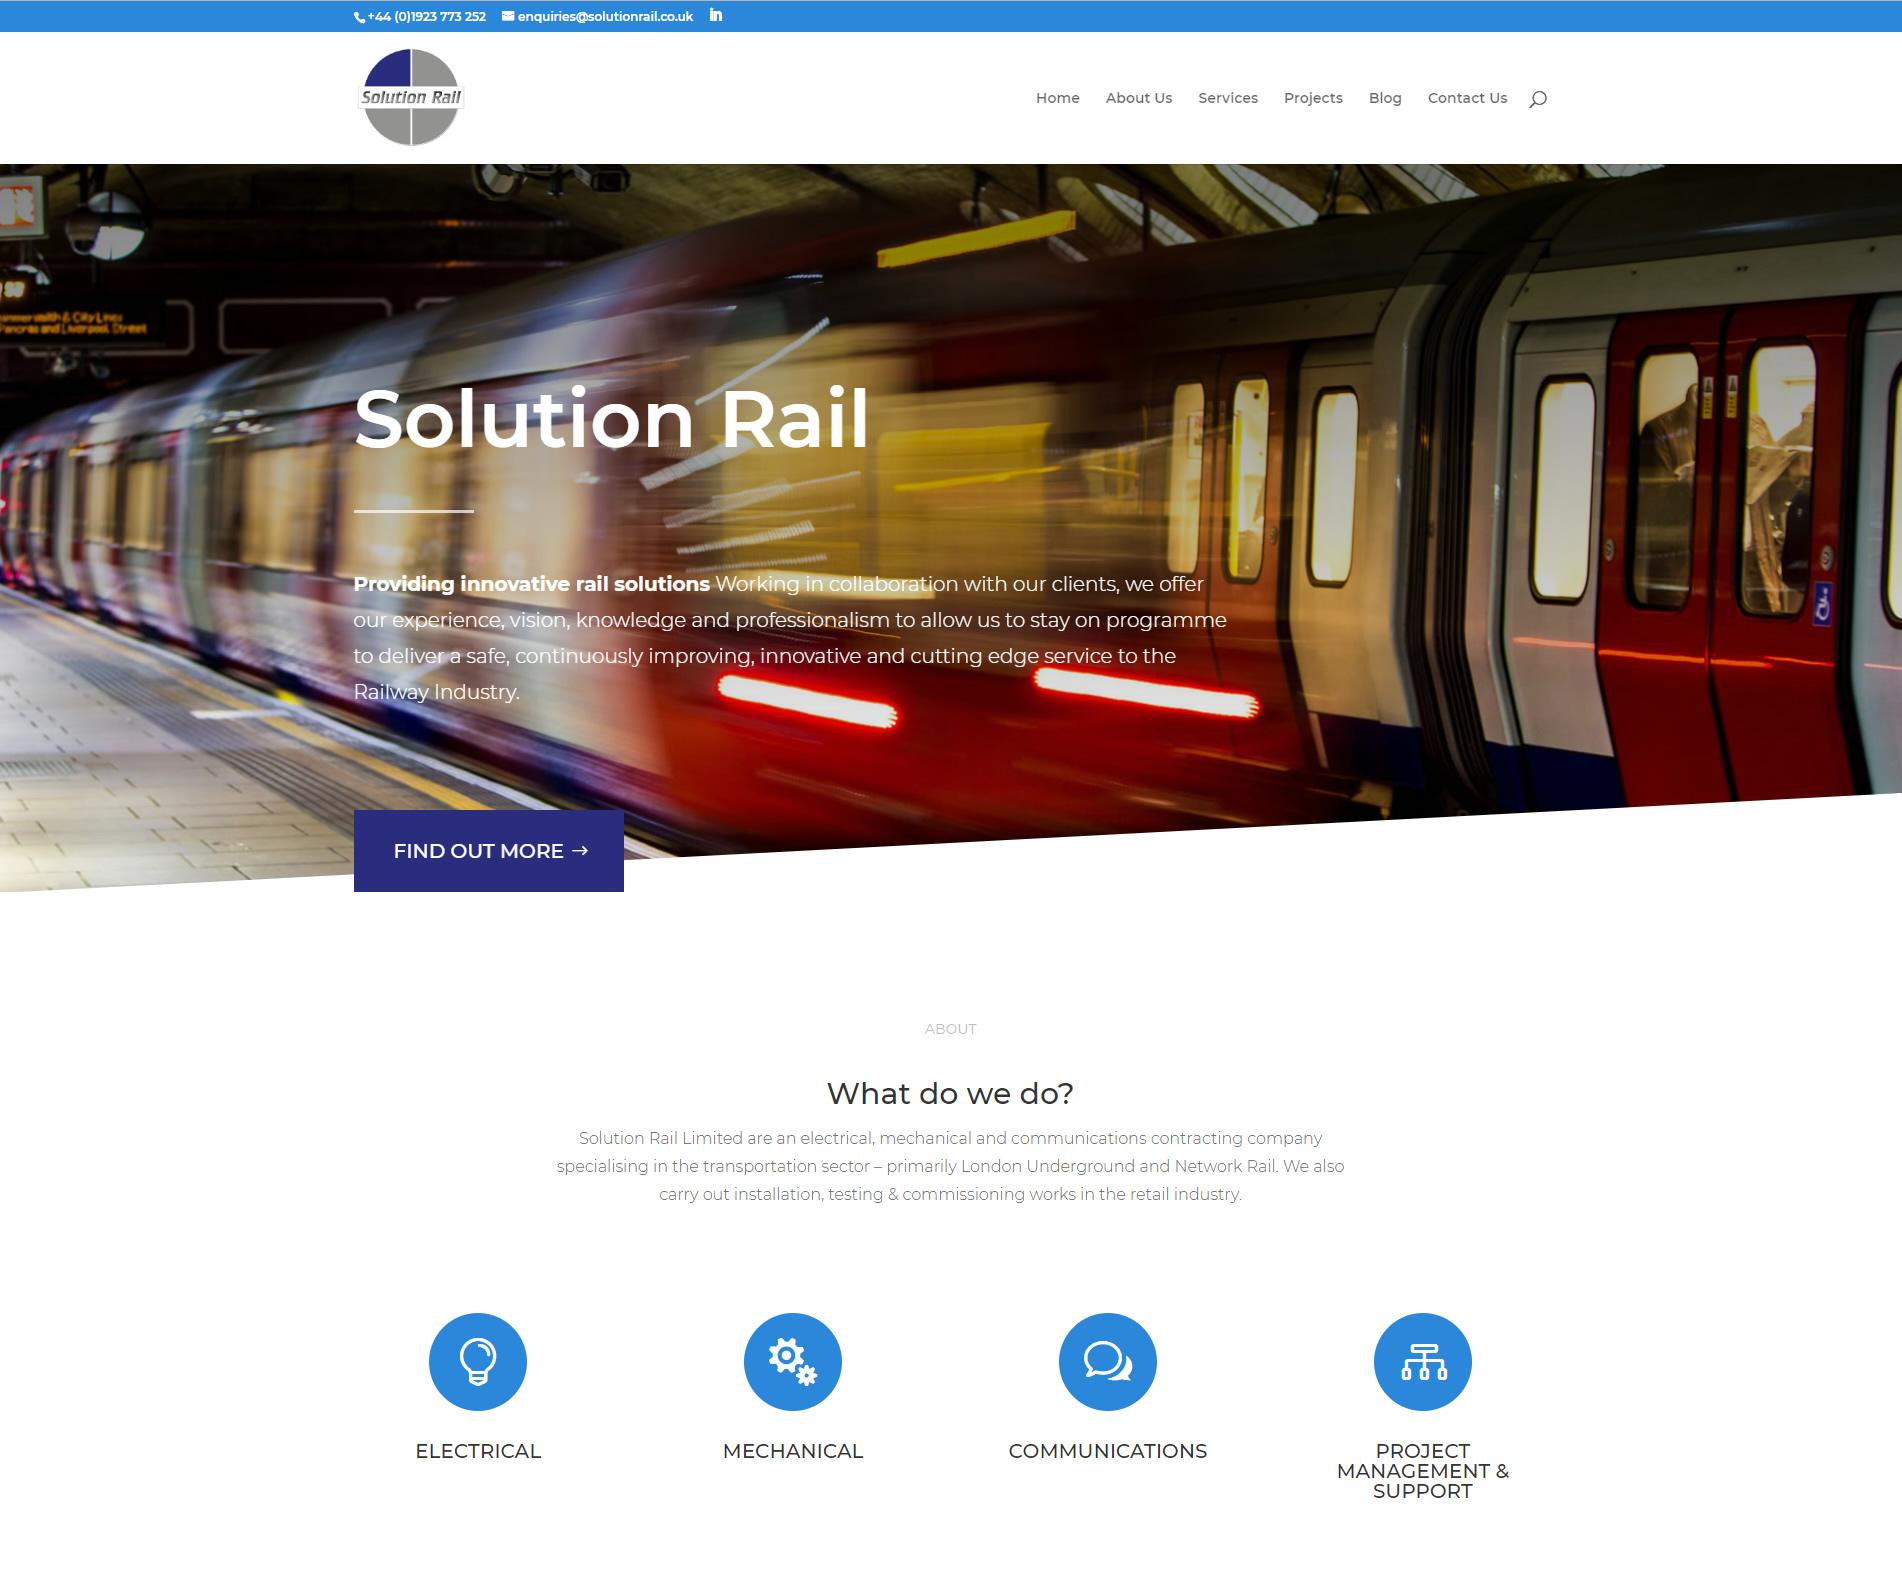 Solution Rail image